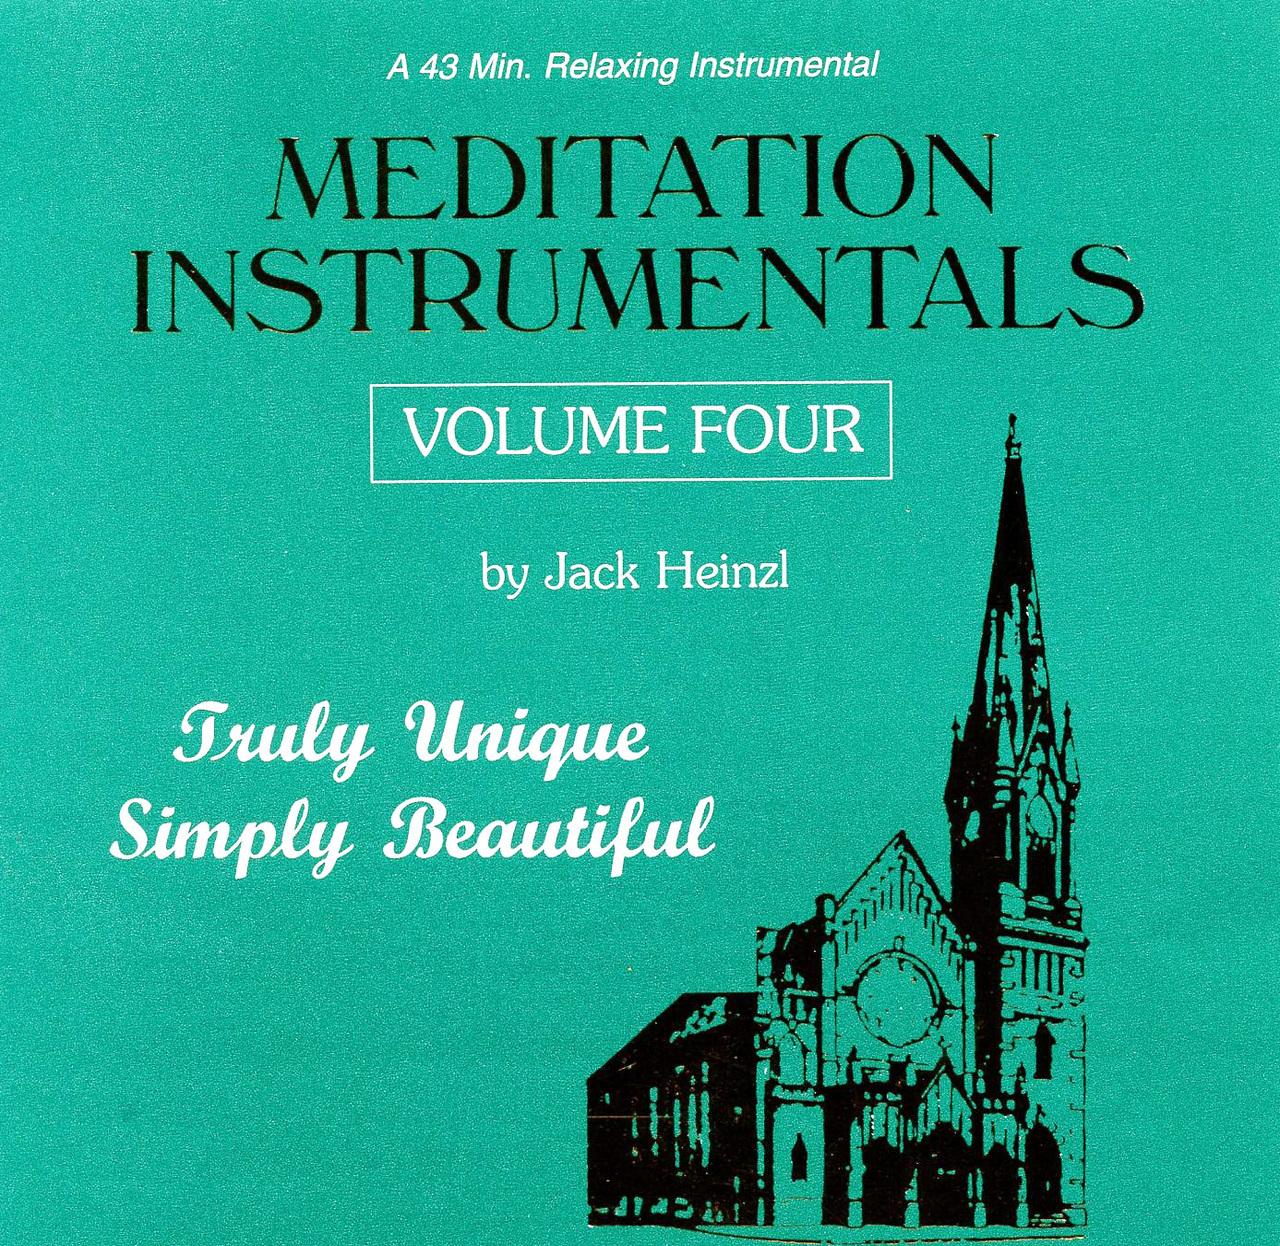 Meditation instrumentals   vol. 4 by jack heinzl